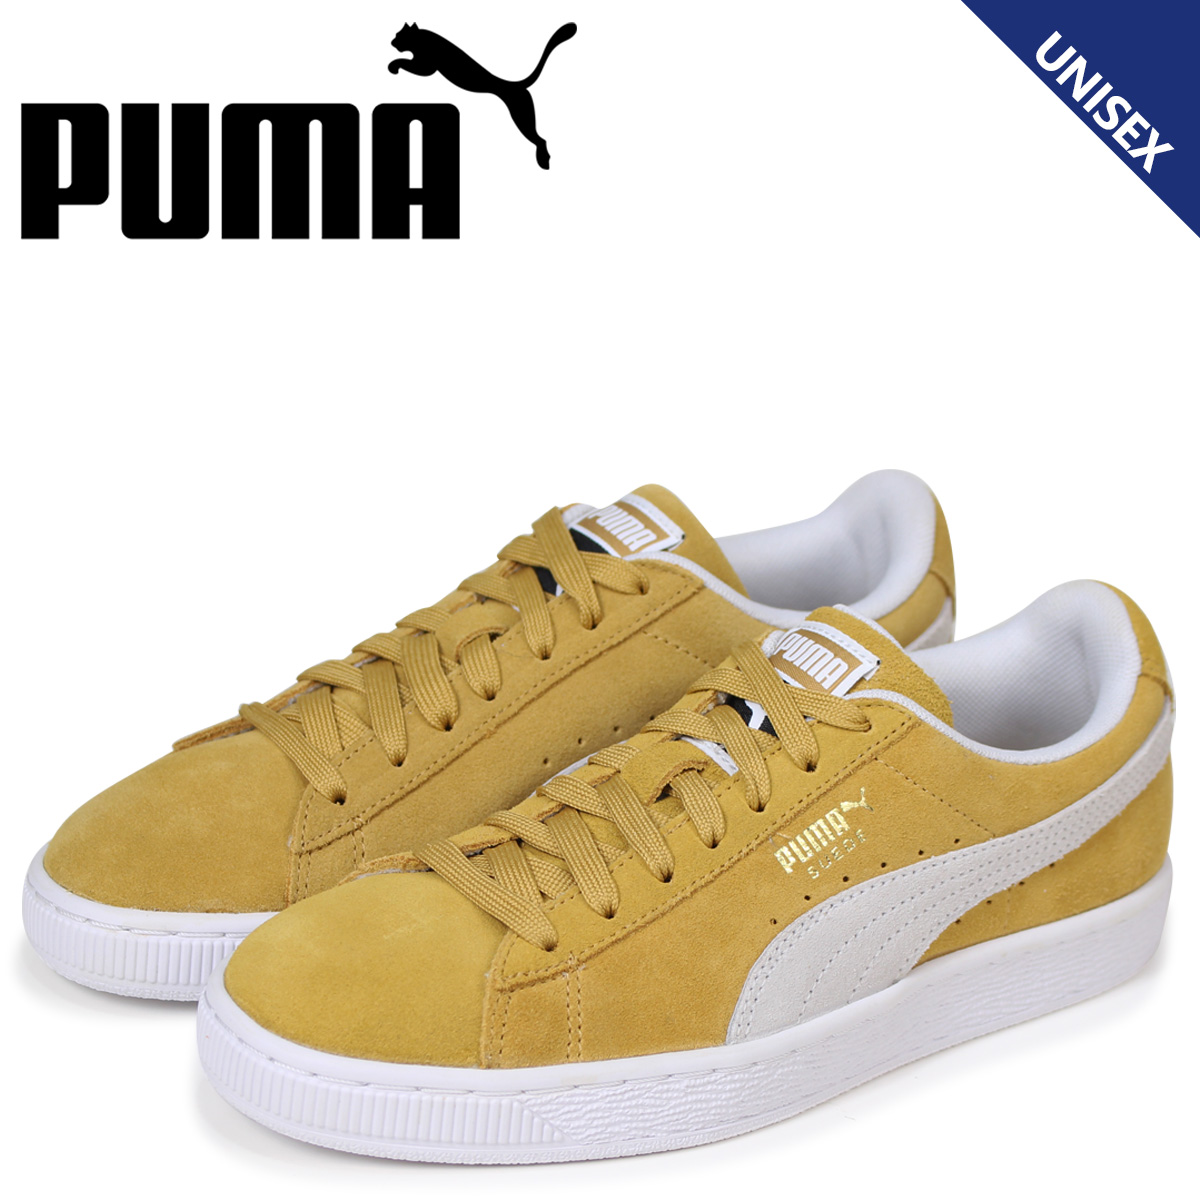 promo code b3e08 b0cf7 PUMA Puma suede classical music sneakers men gap Dis SUEDE CLASSIC  365,347-10 yellow